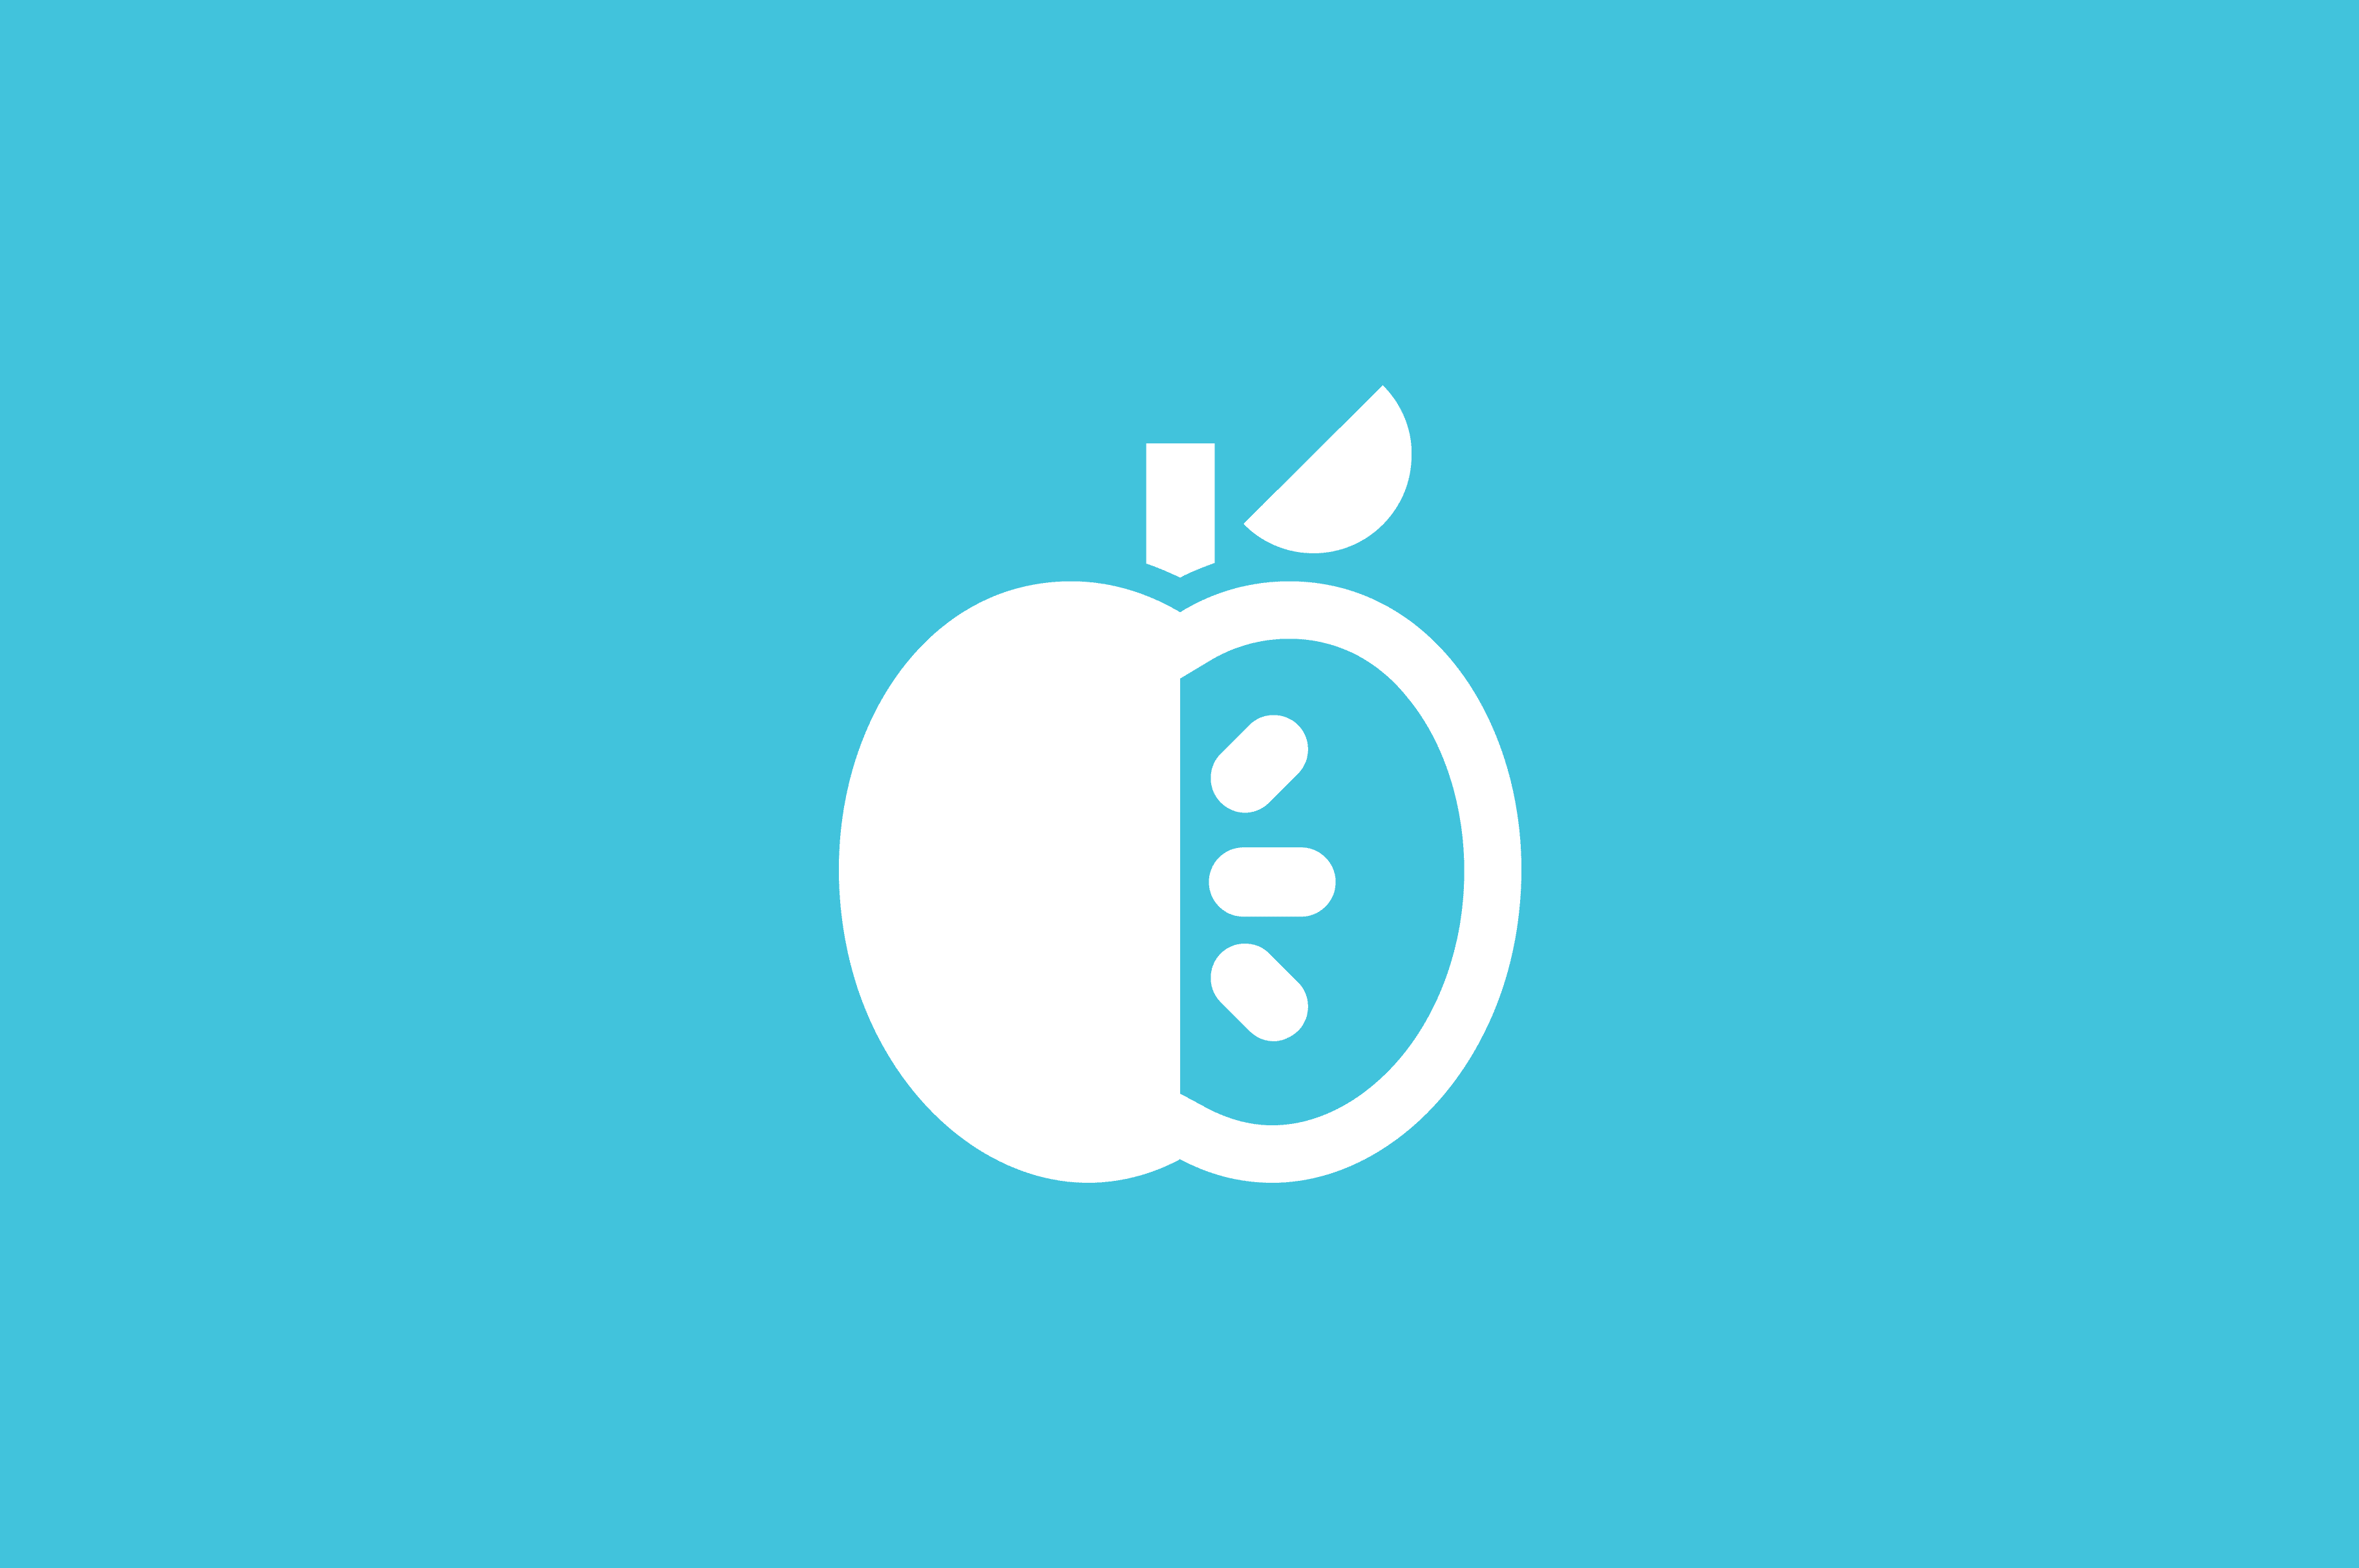 Ingredient icon